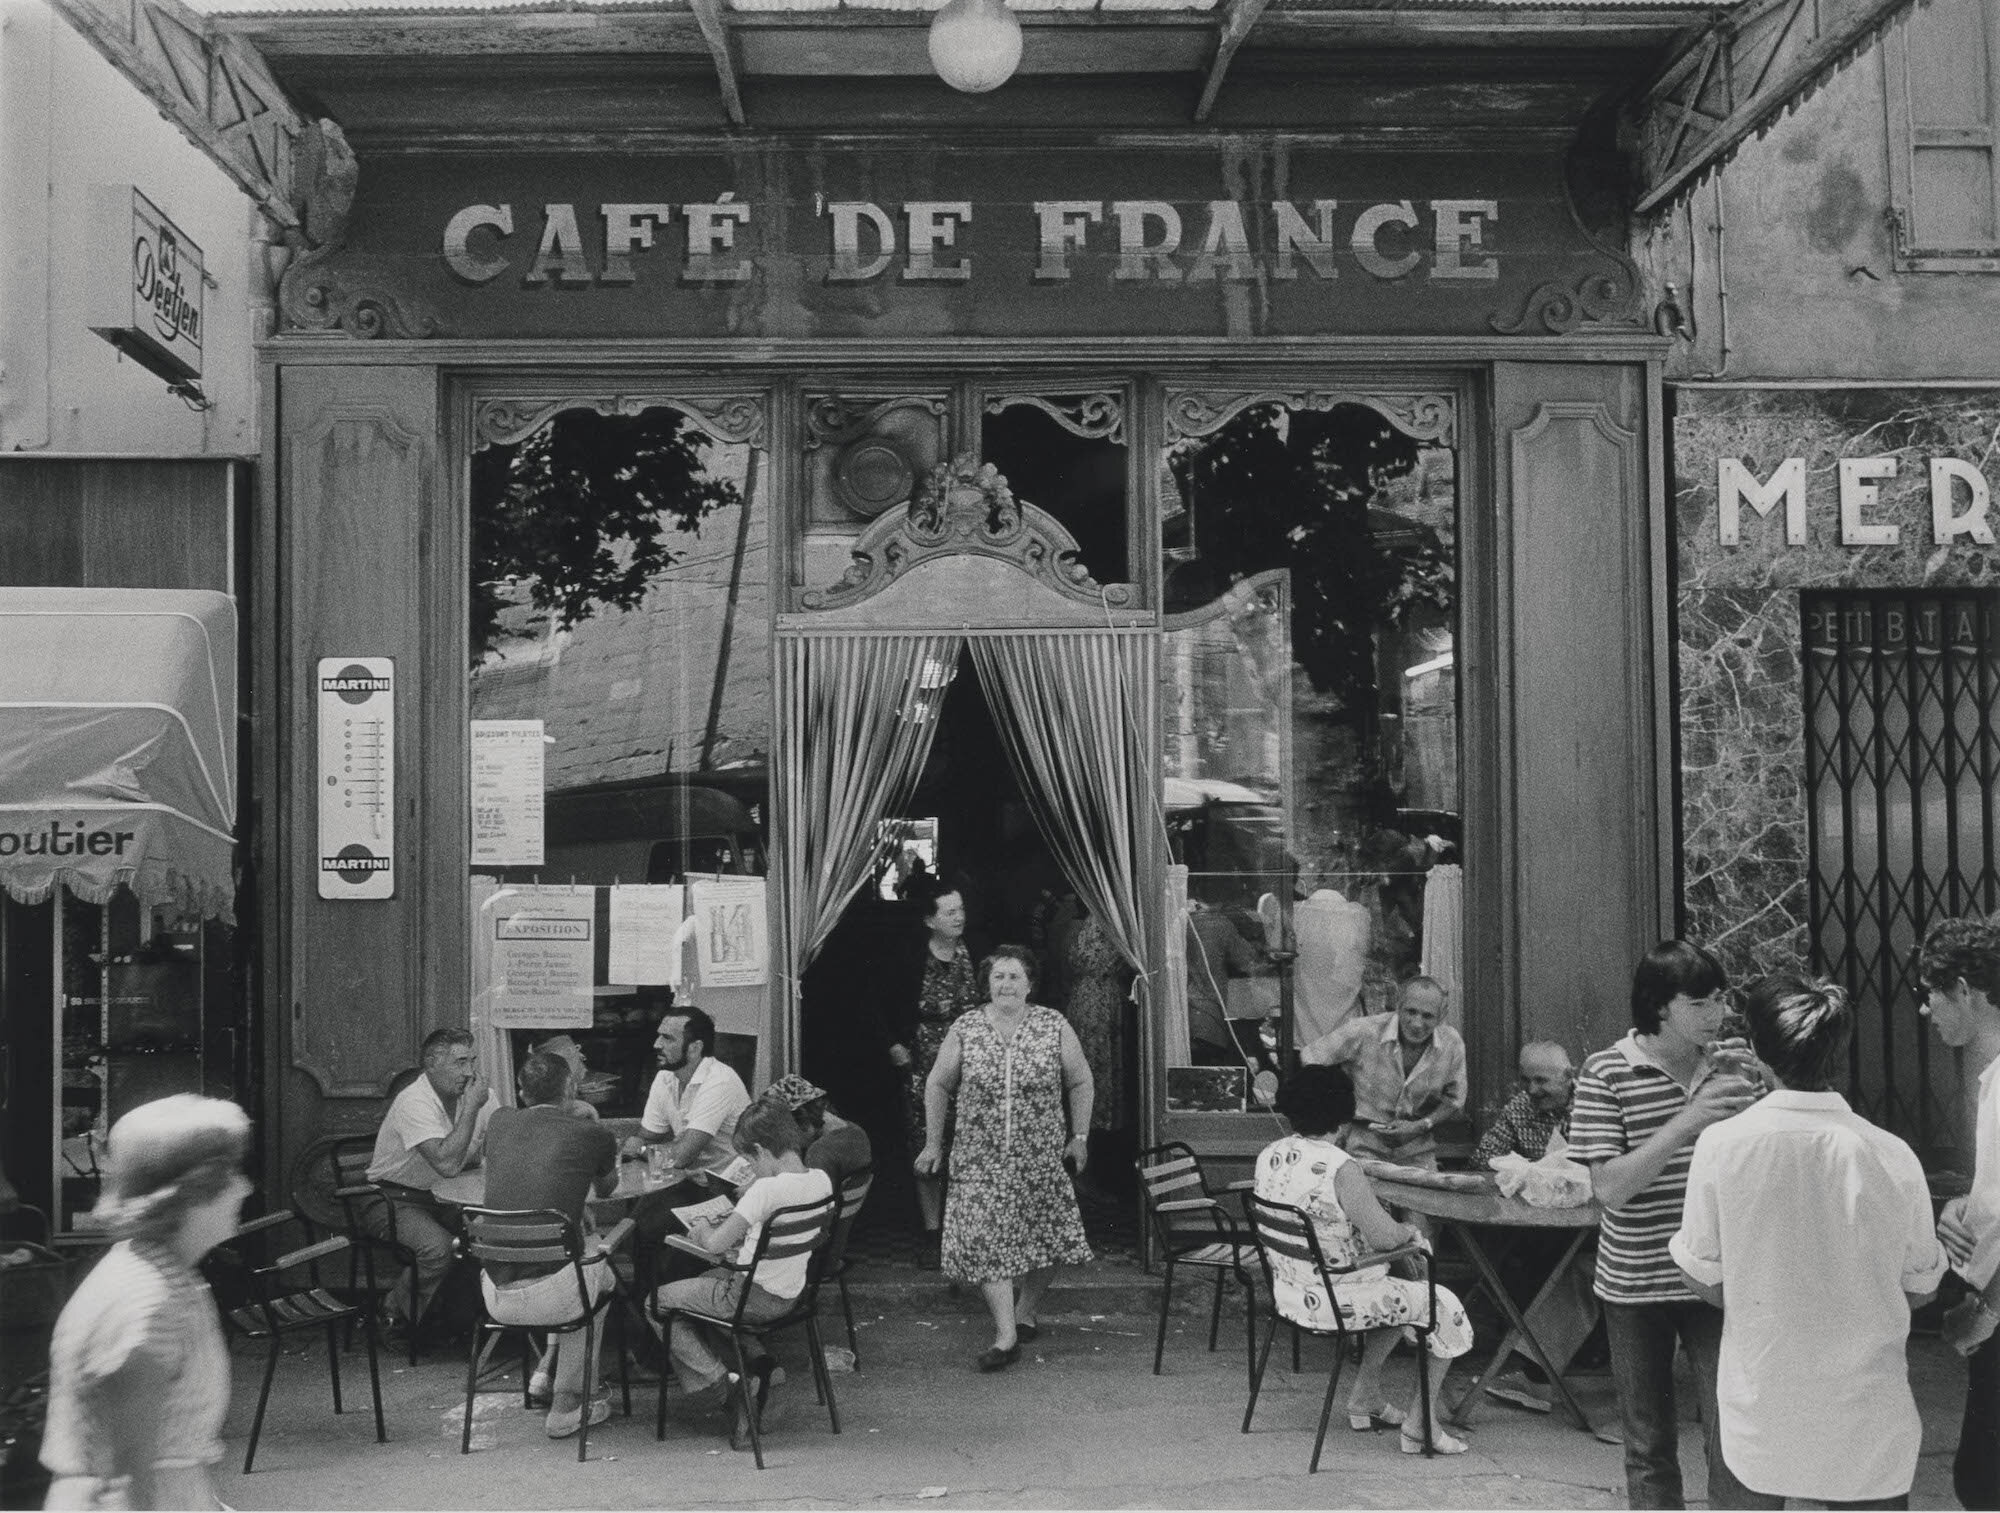 WILLY RONIS (1910-2009) L'Isle sur la Sorgue, 1979